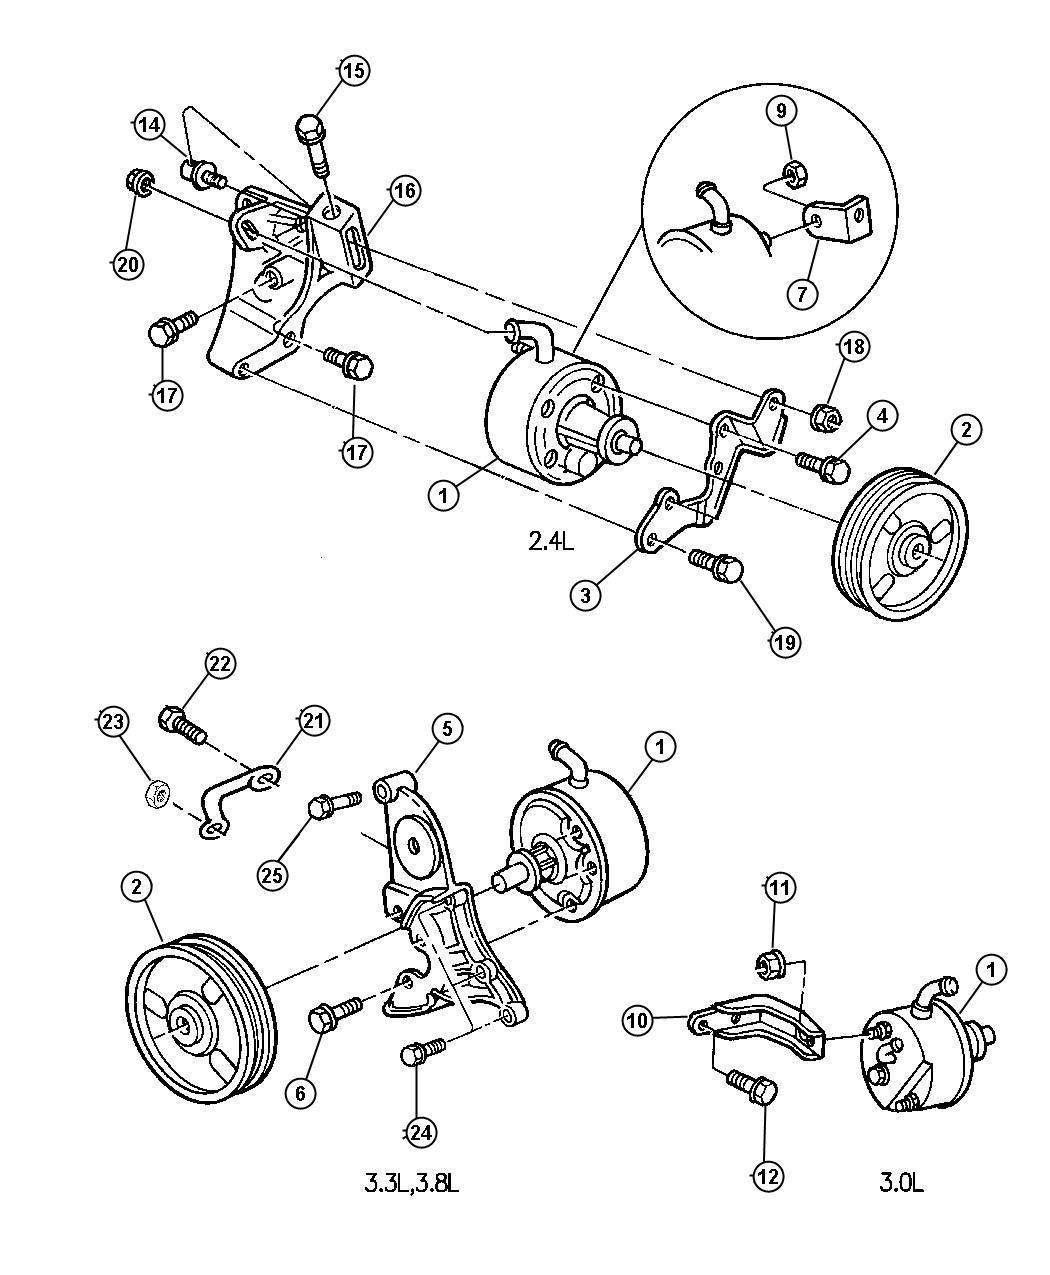 2000 ford taurus dohc engine diagram also 2000 ford ranger 3 0 head